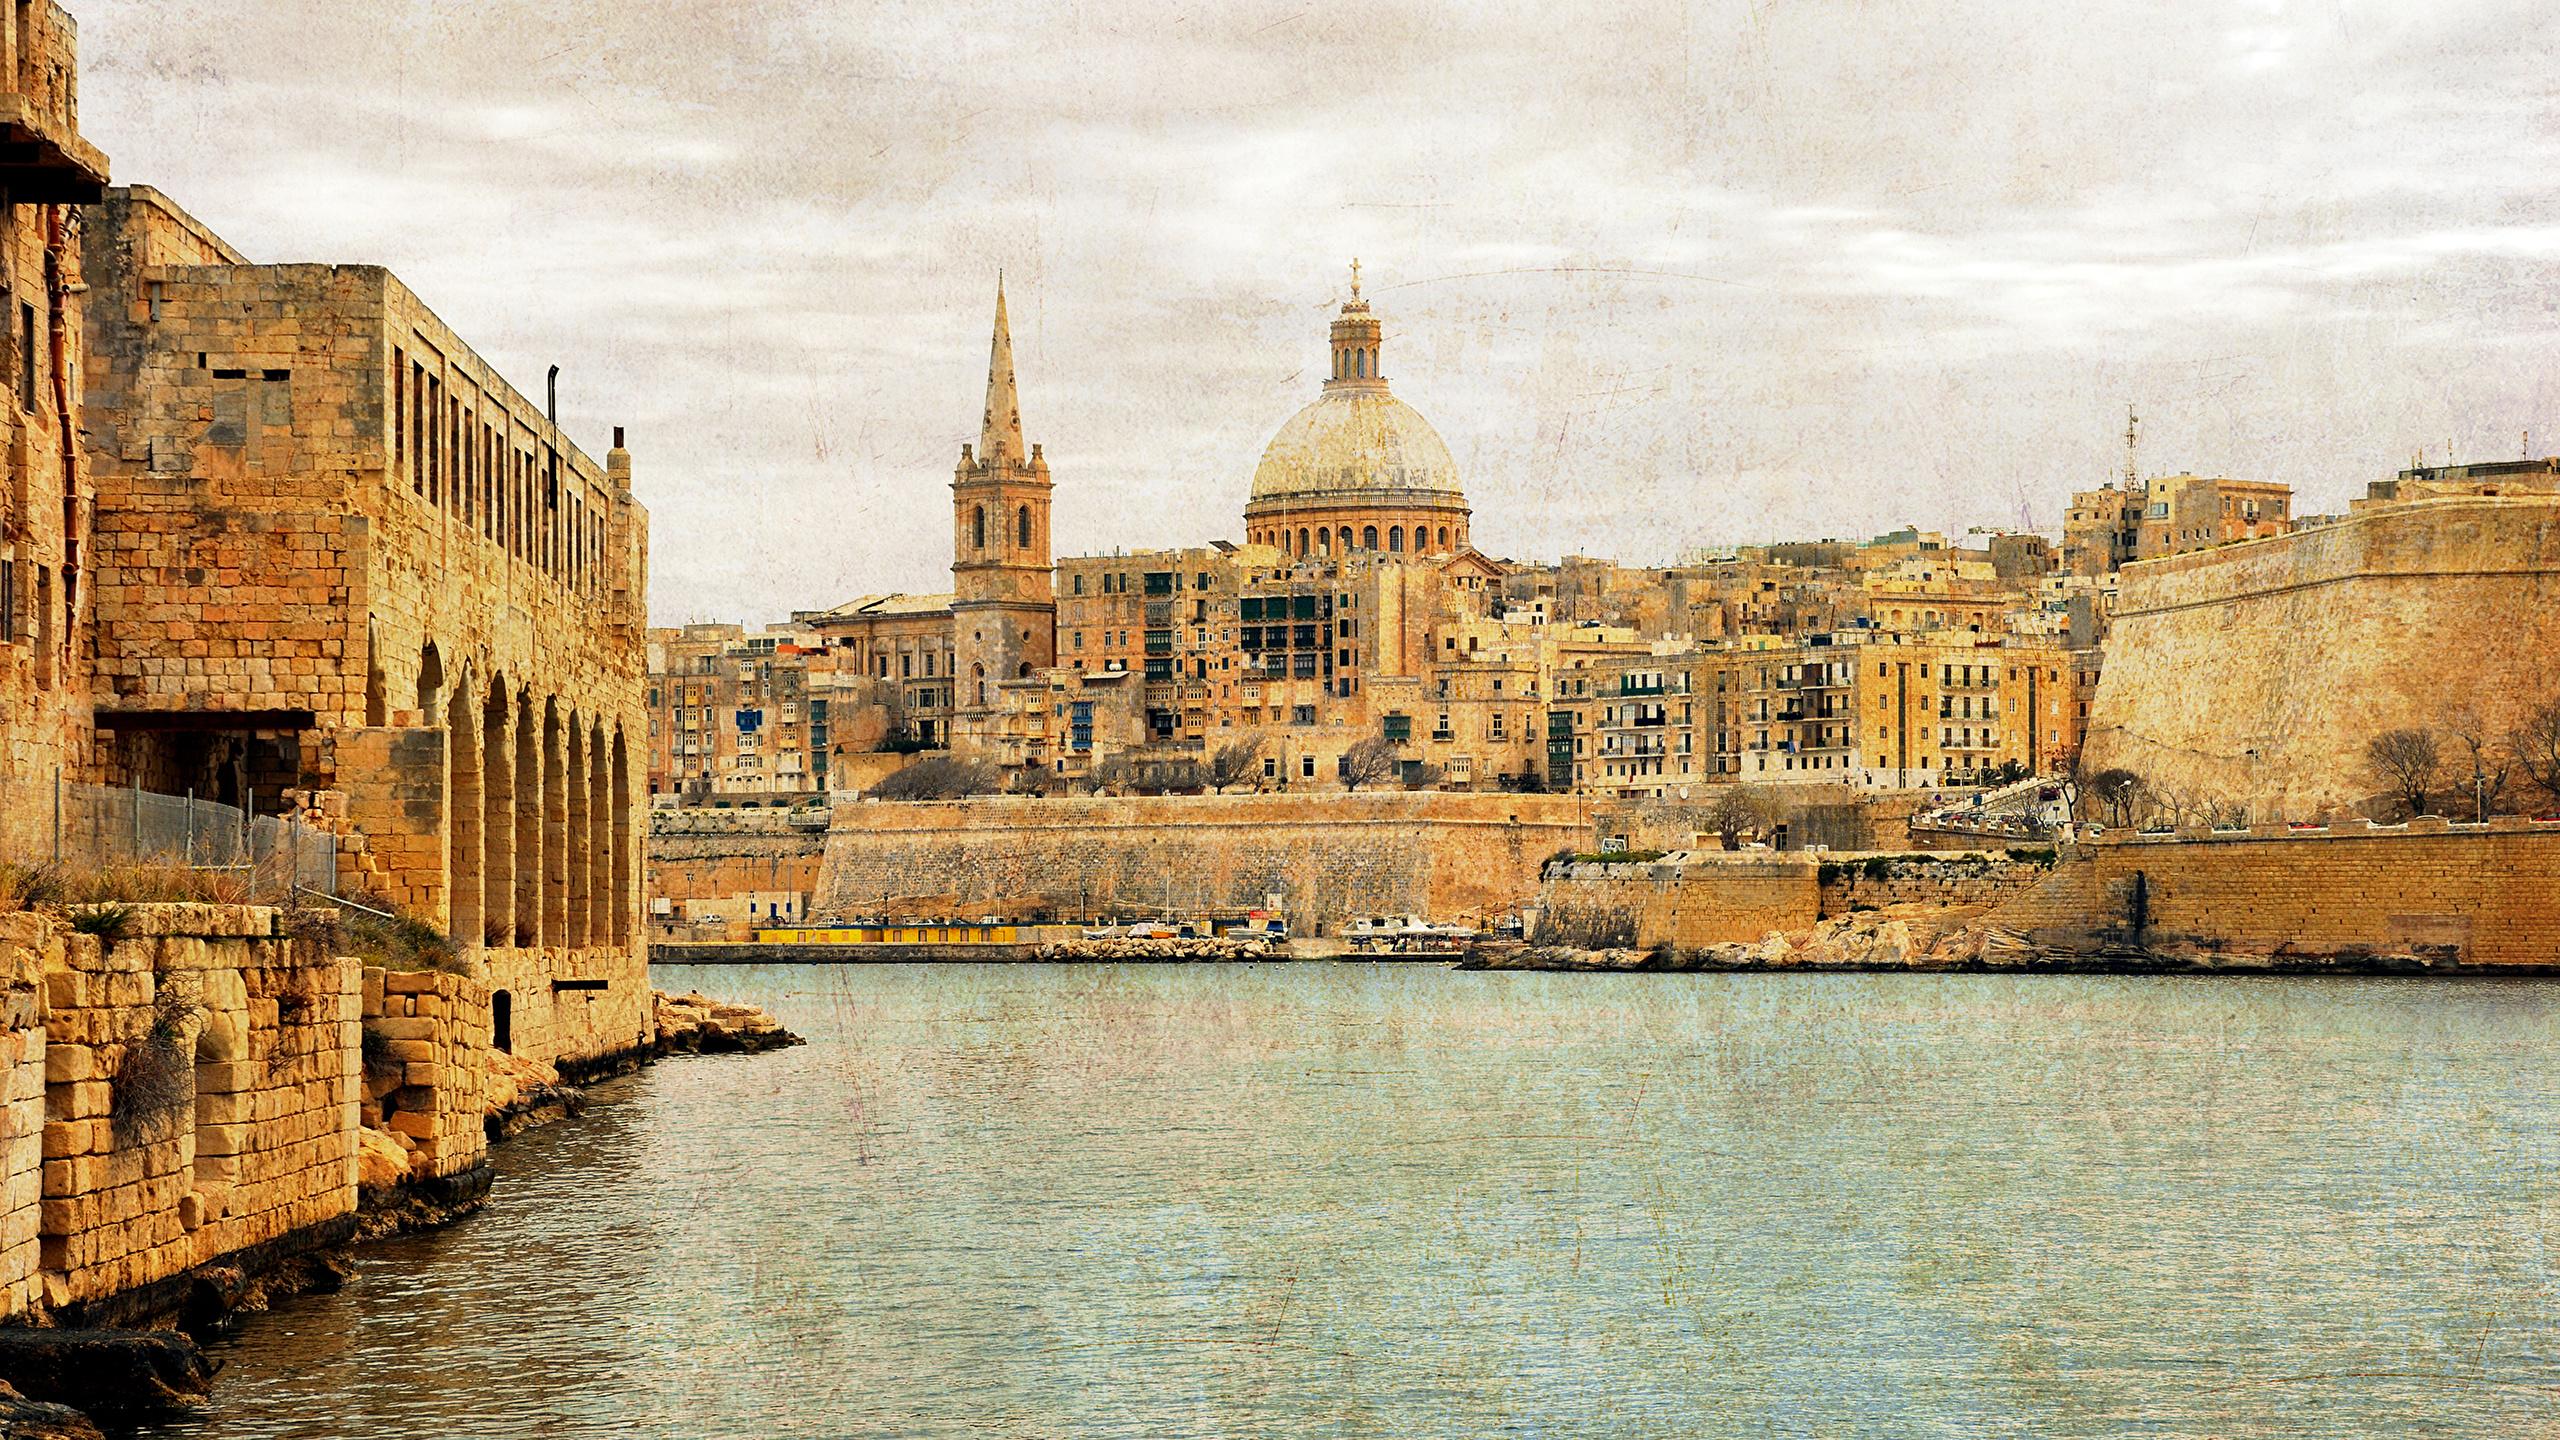 Picture Malta Sliema Bay Cities Building 2560x1440 Images, Photos, Reviews